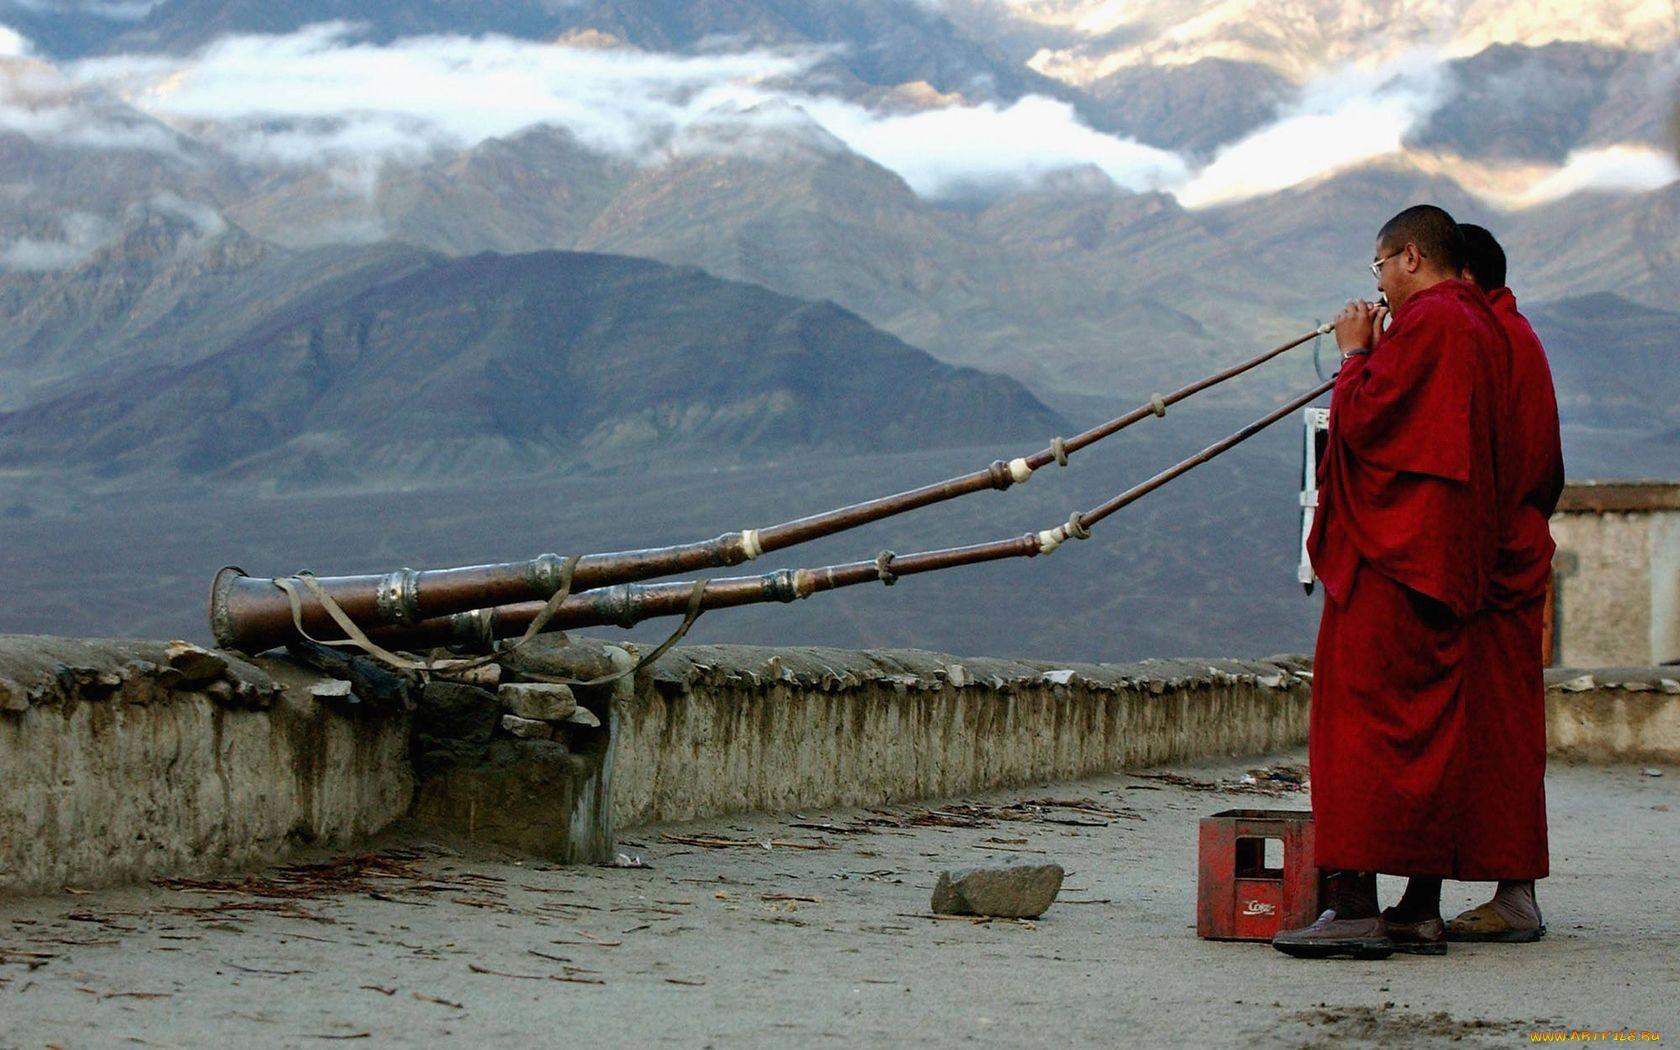 стоял тибет фото монахов пвх обладают